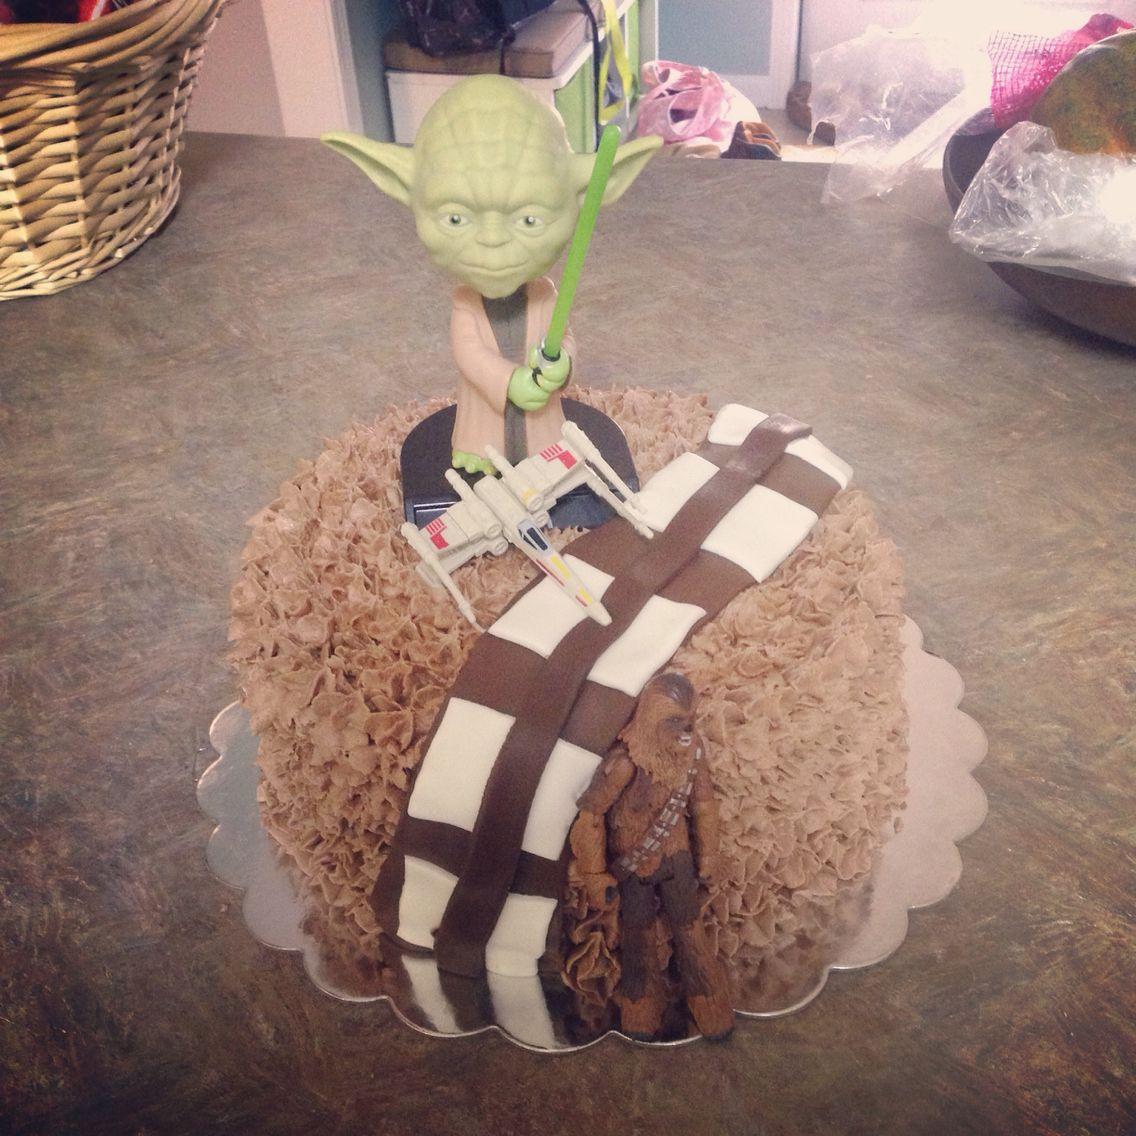 Chewbaca theme cake for my 6 year old!